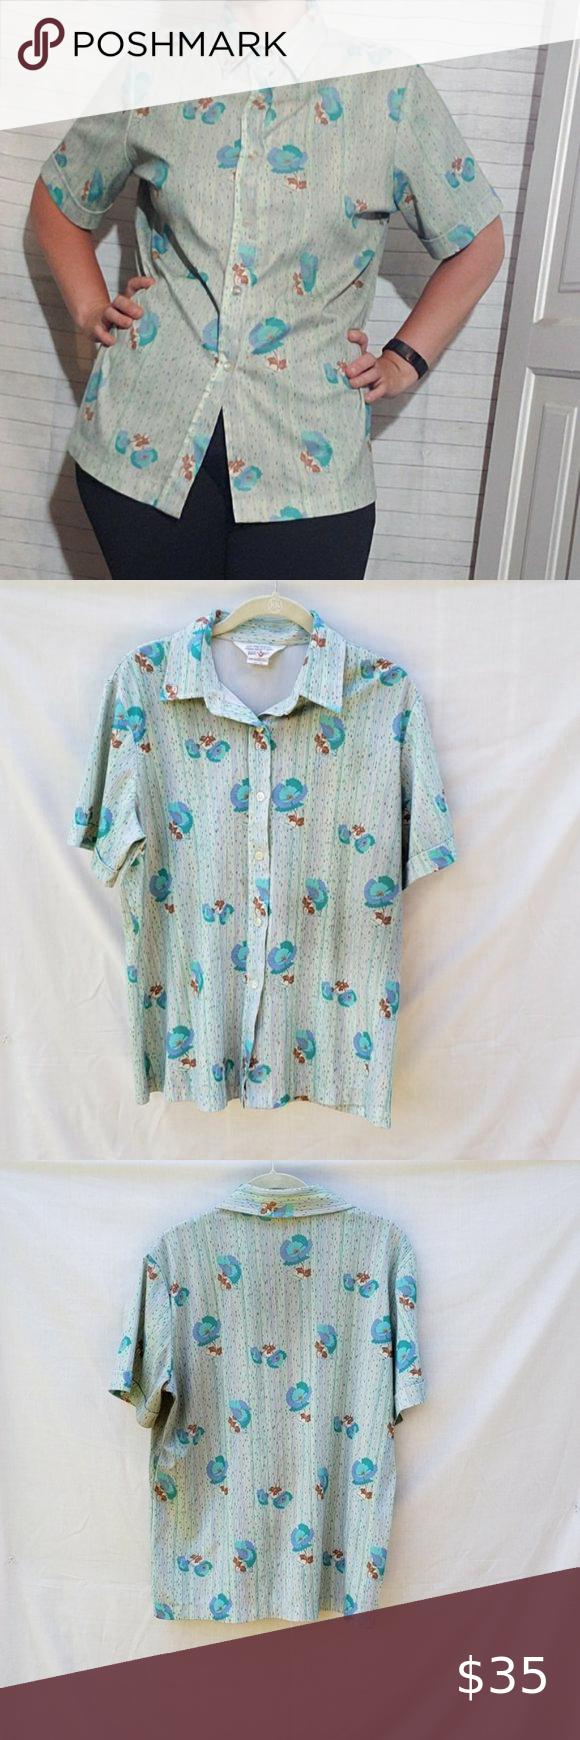 Vintage 70s Short Sleeve Floral Poly Blouse